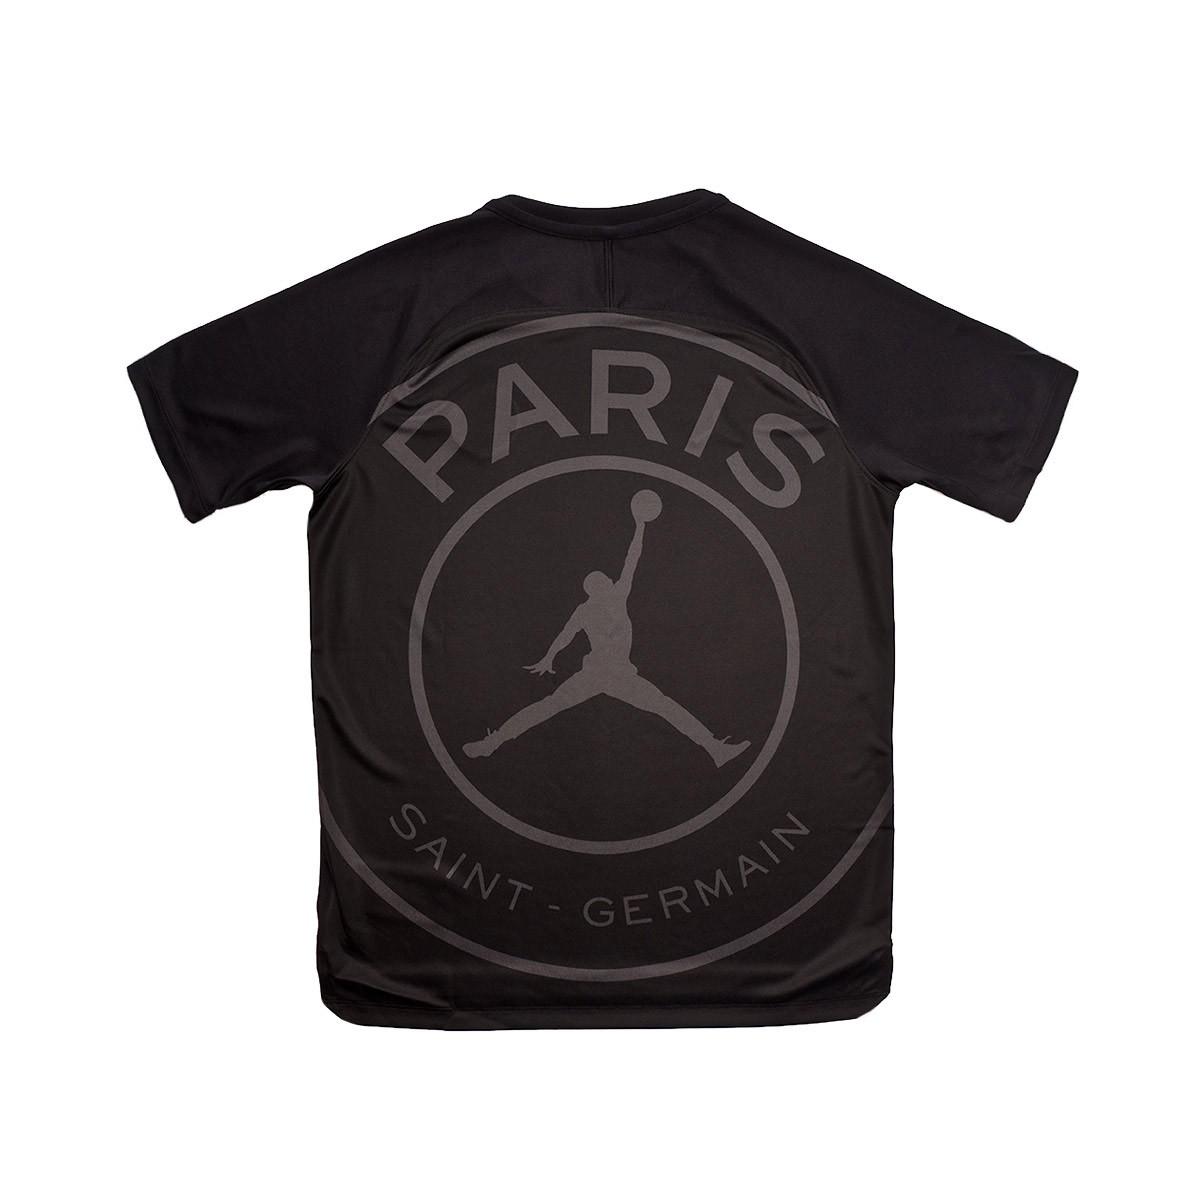 cheap for discount 58133 e6743 Camiseta Paris Saint-Germain Dry Squad SS GX CL 2018-2019 Niño  Black-Anthracite-White